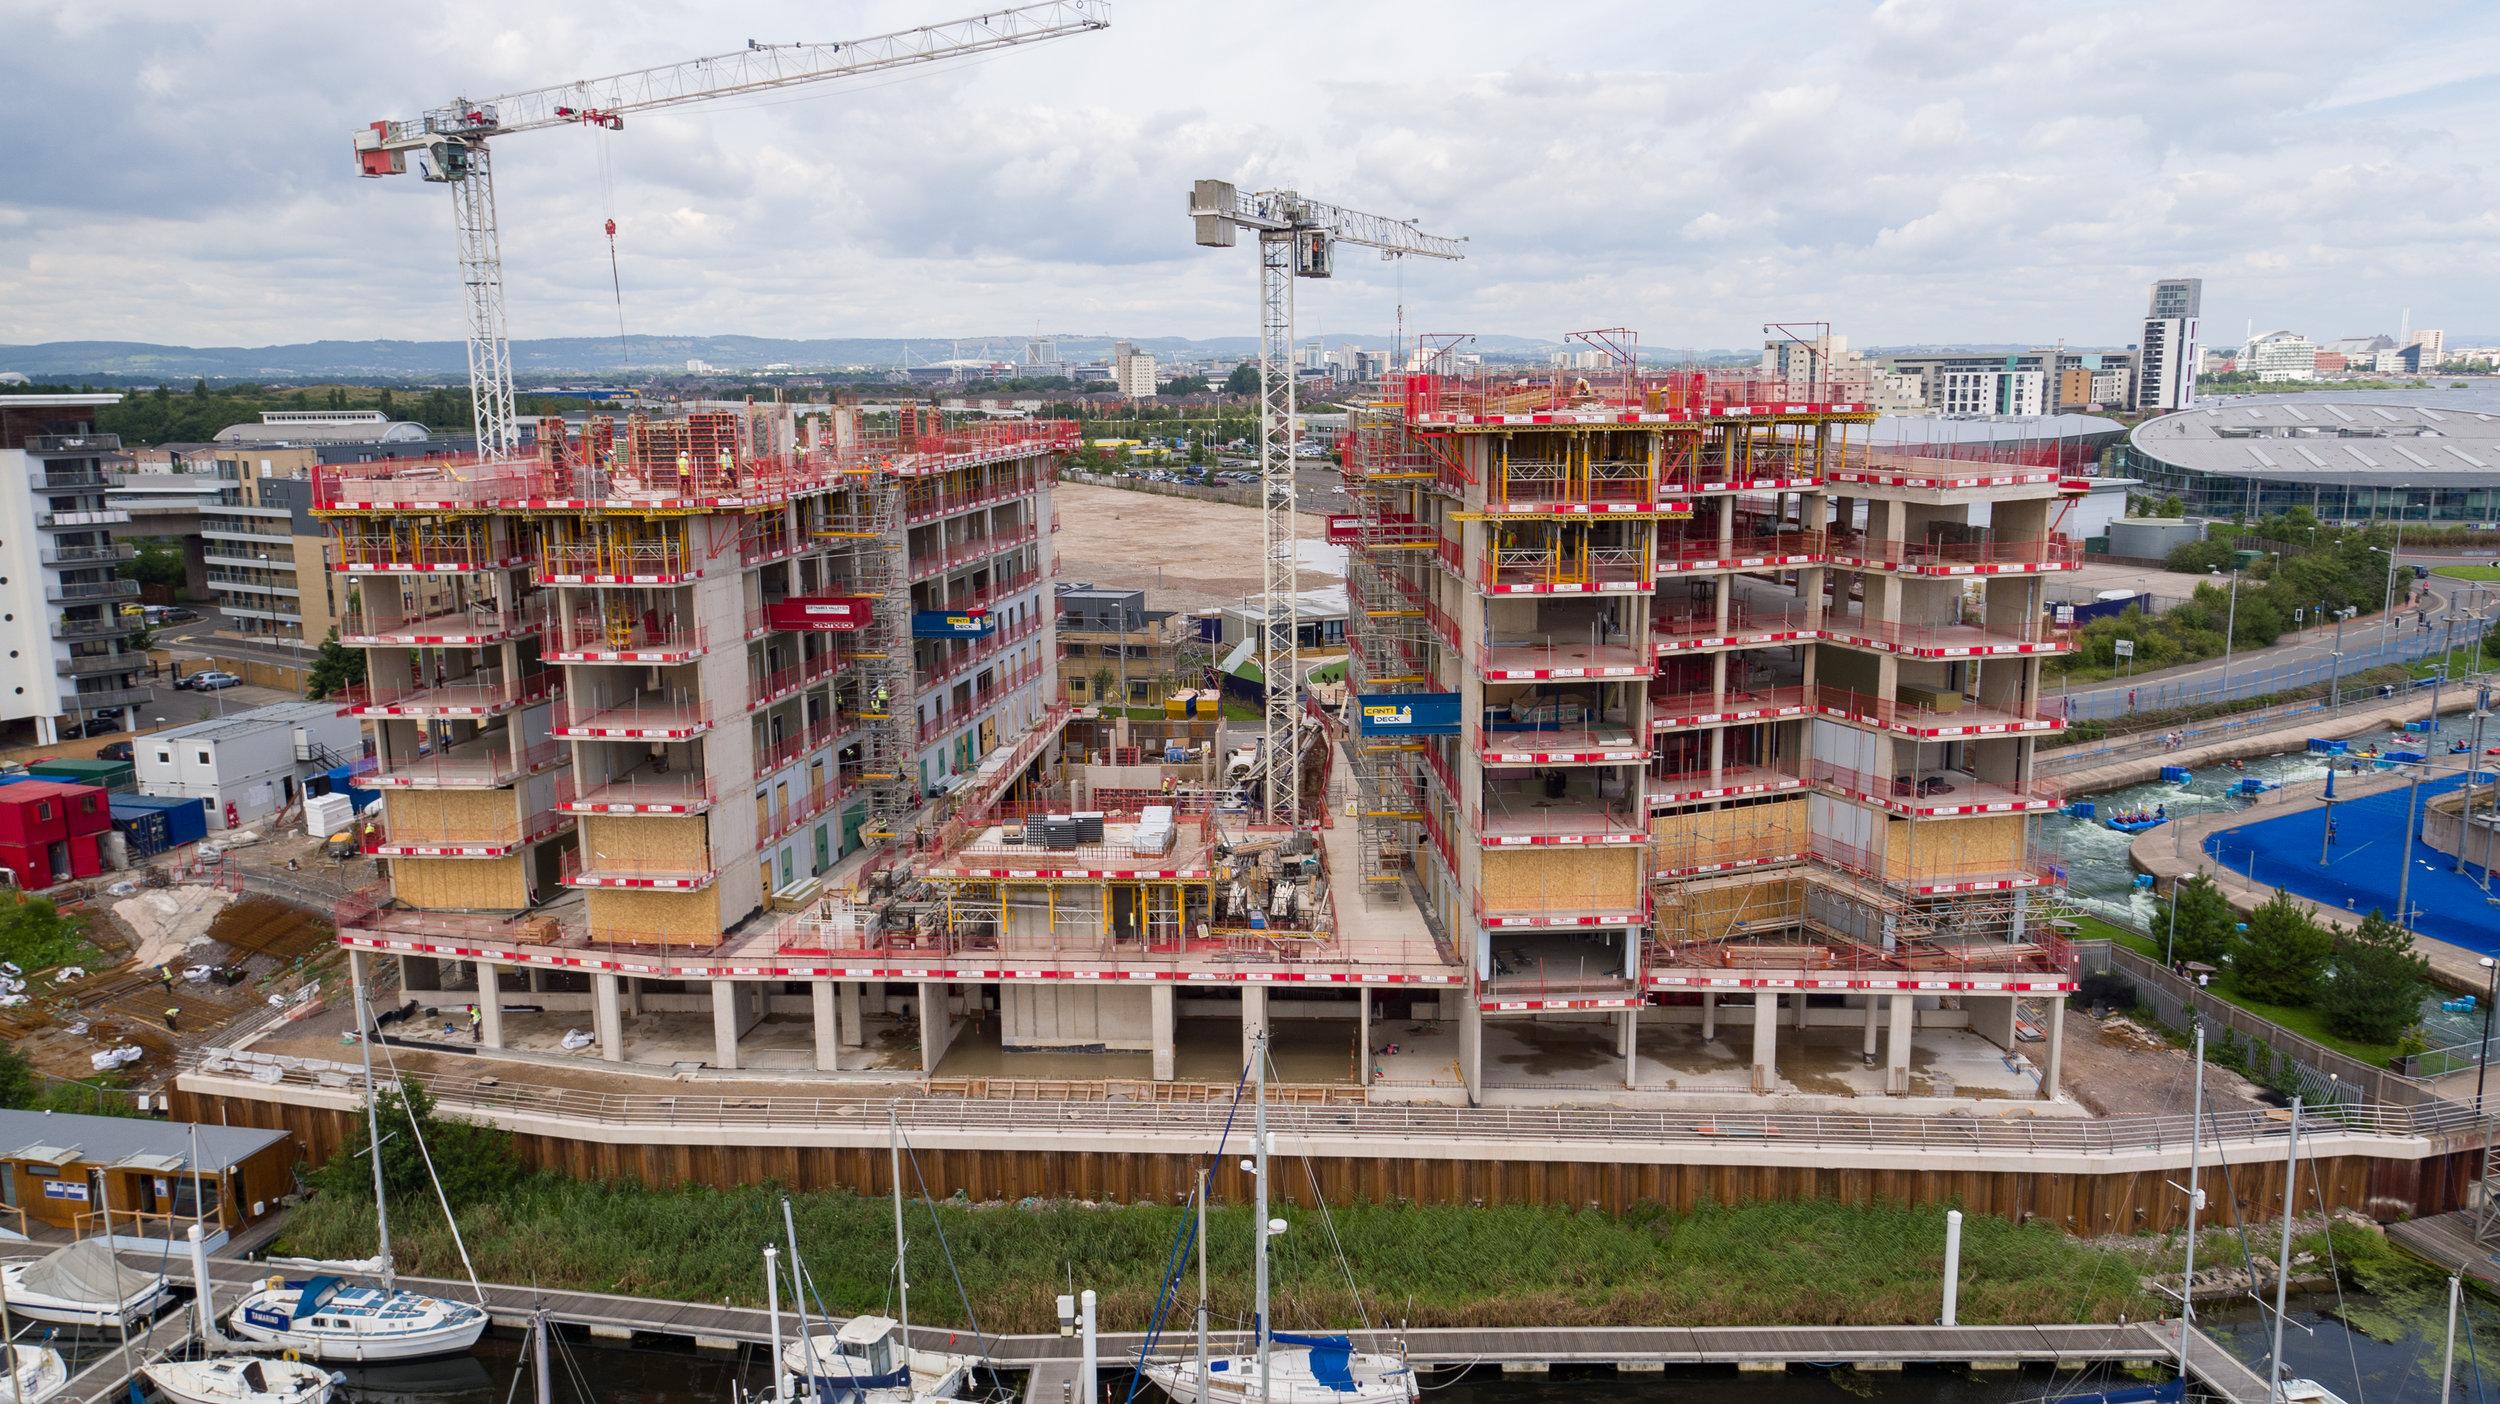 Cardiff 3 August 2017.jpg